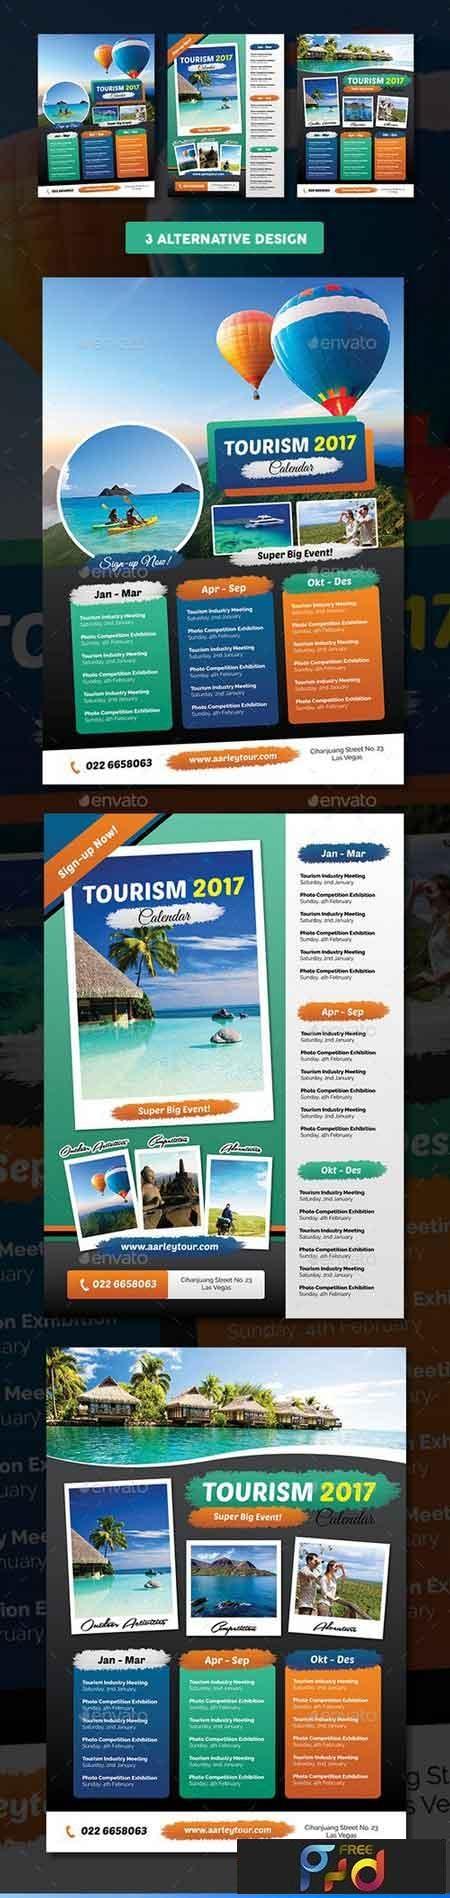 Tourism Events Calendar Flyer Template 18182109 1